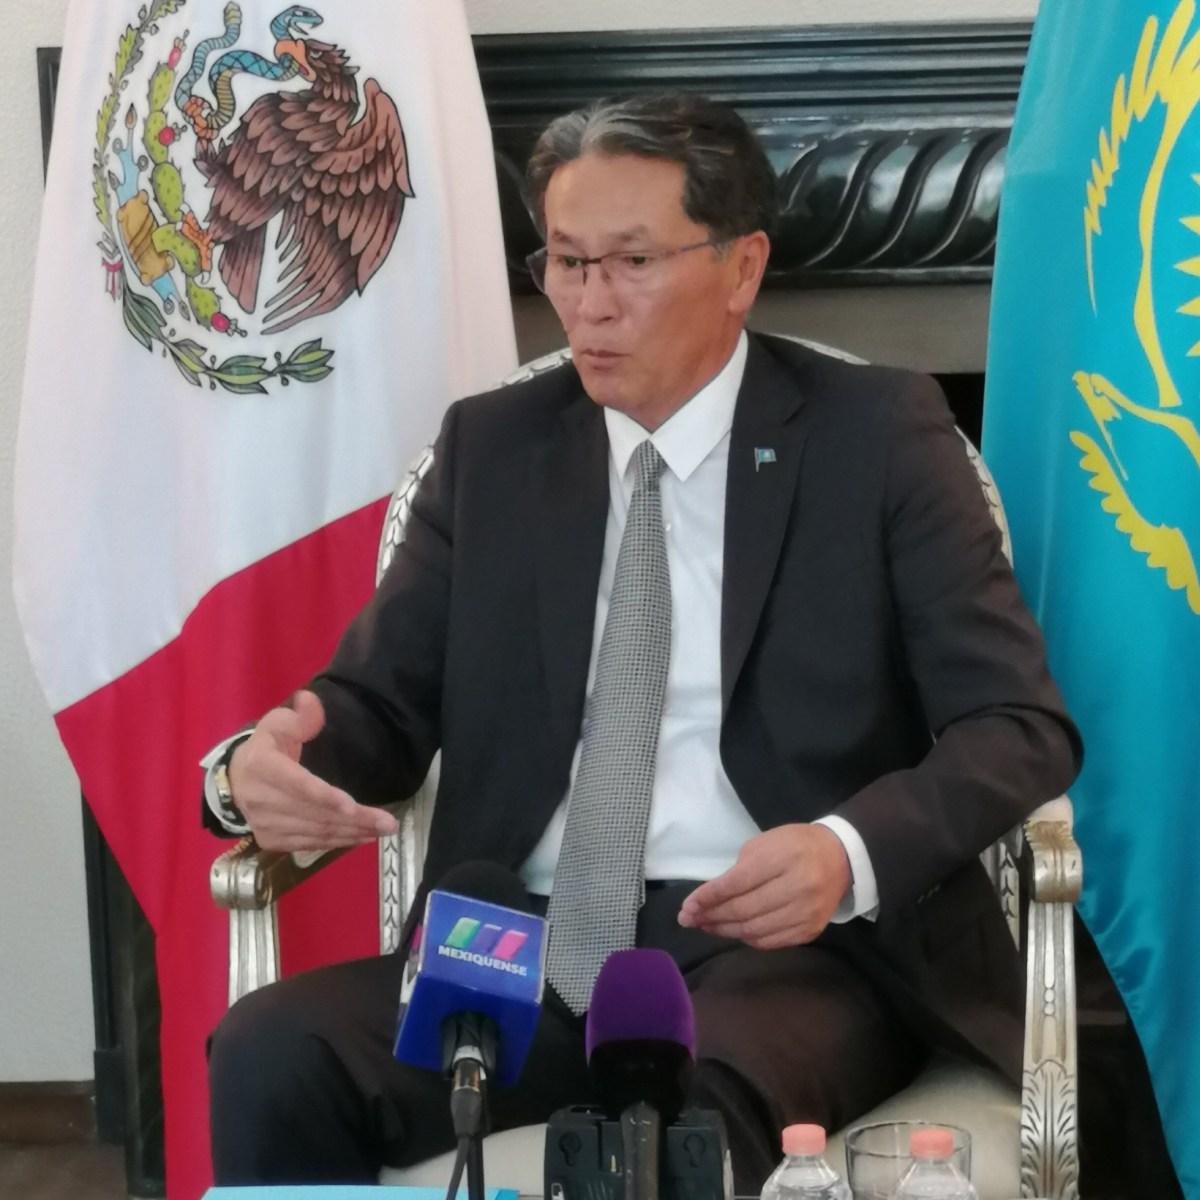 Kazajstán busca fortalecer lazos comerciales y turísticos con México